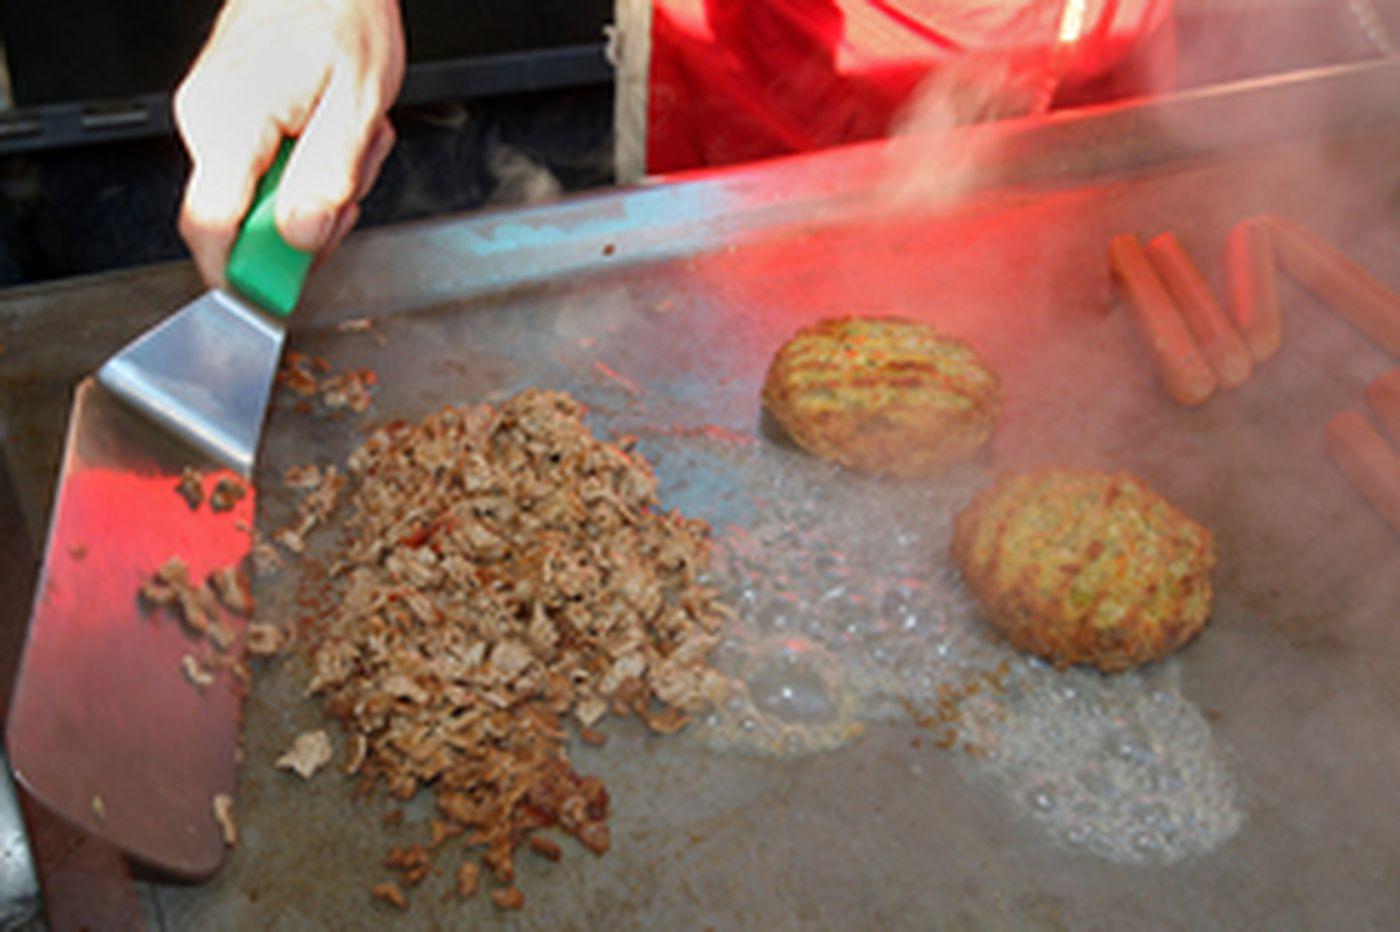 Venue vegan: Phillies, Citizens Bank Park find a winning combo with meatless menu